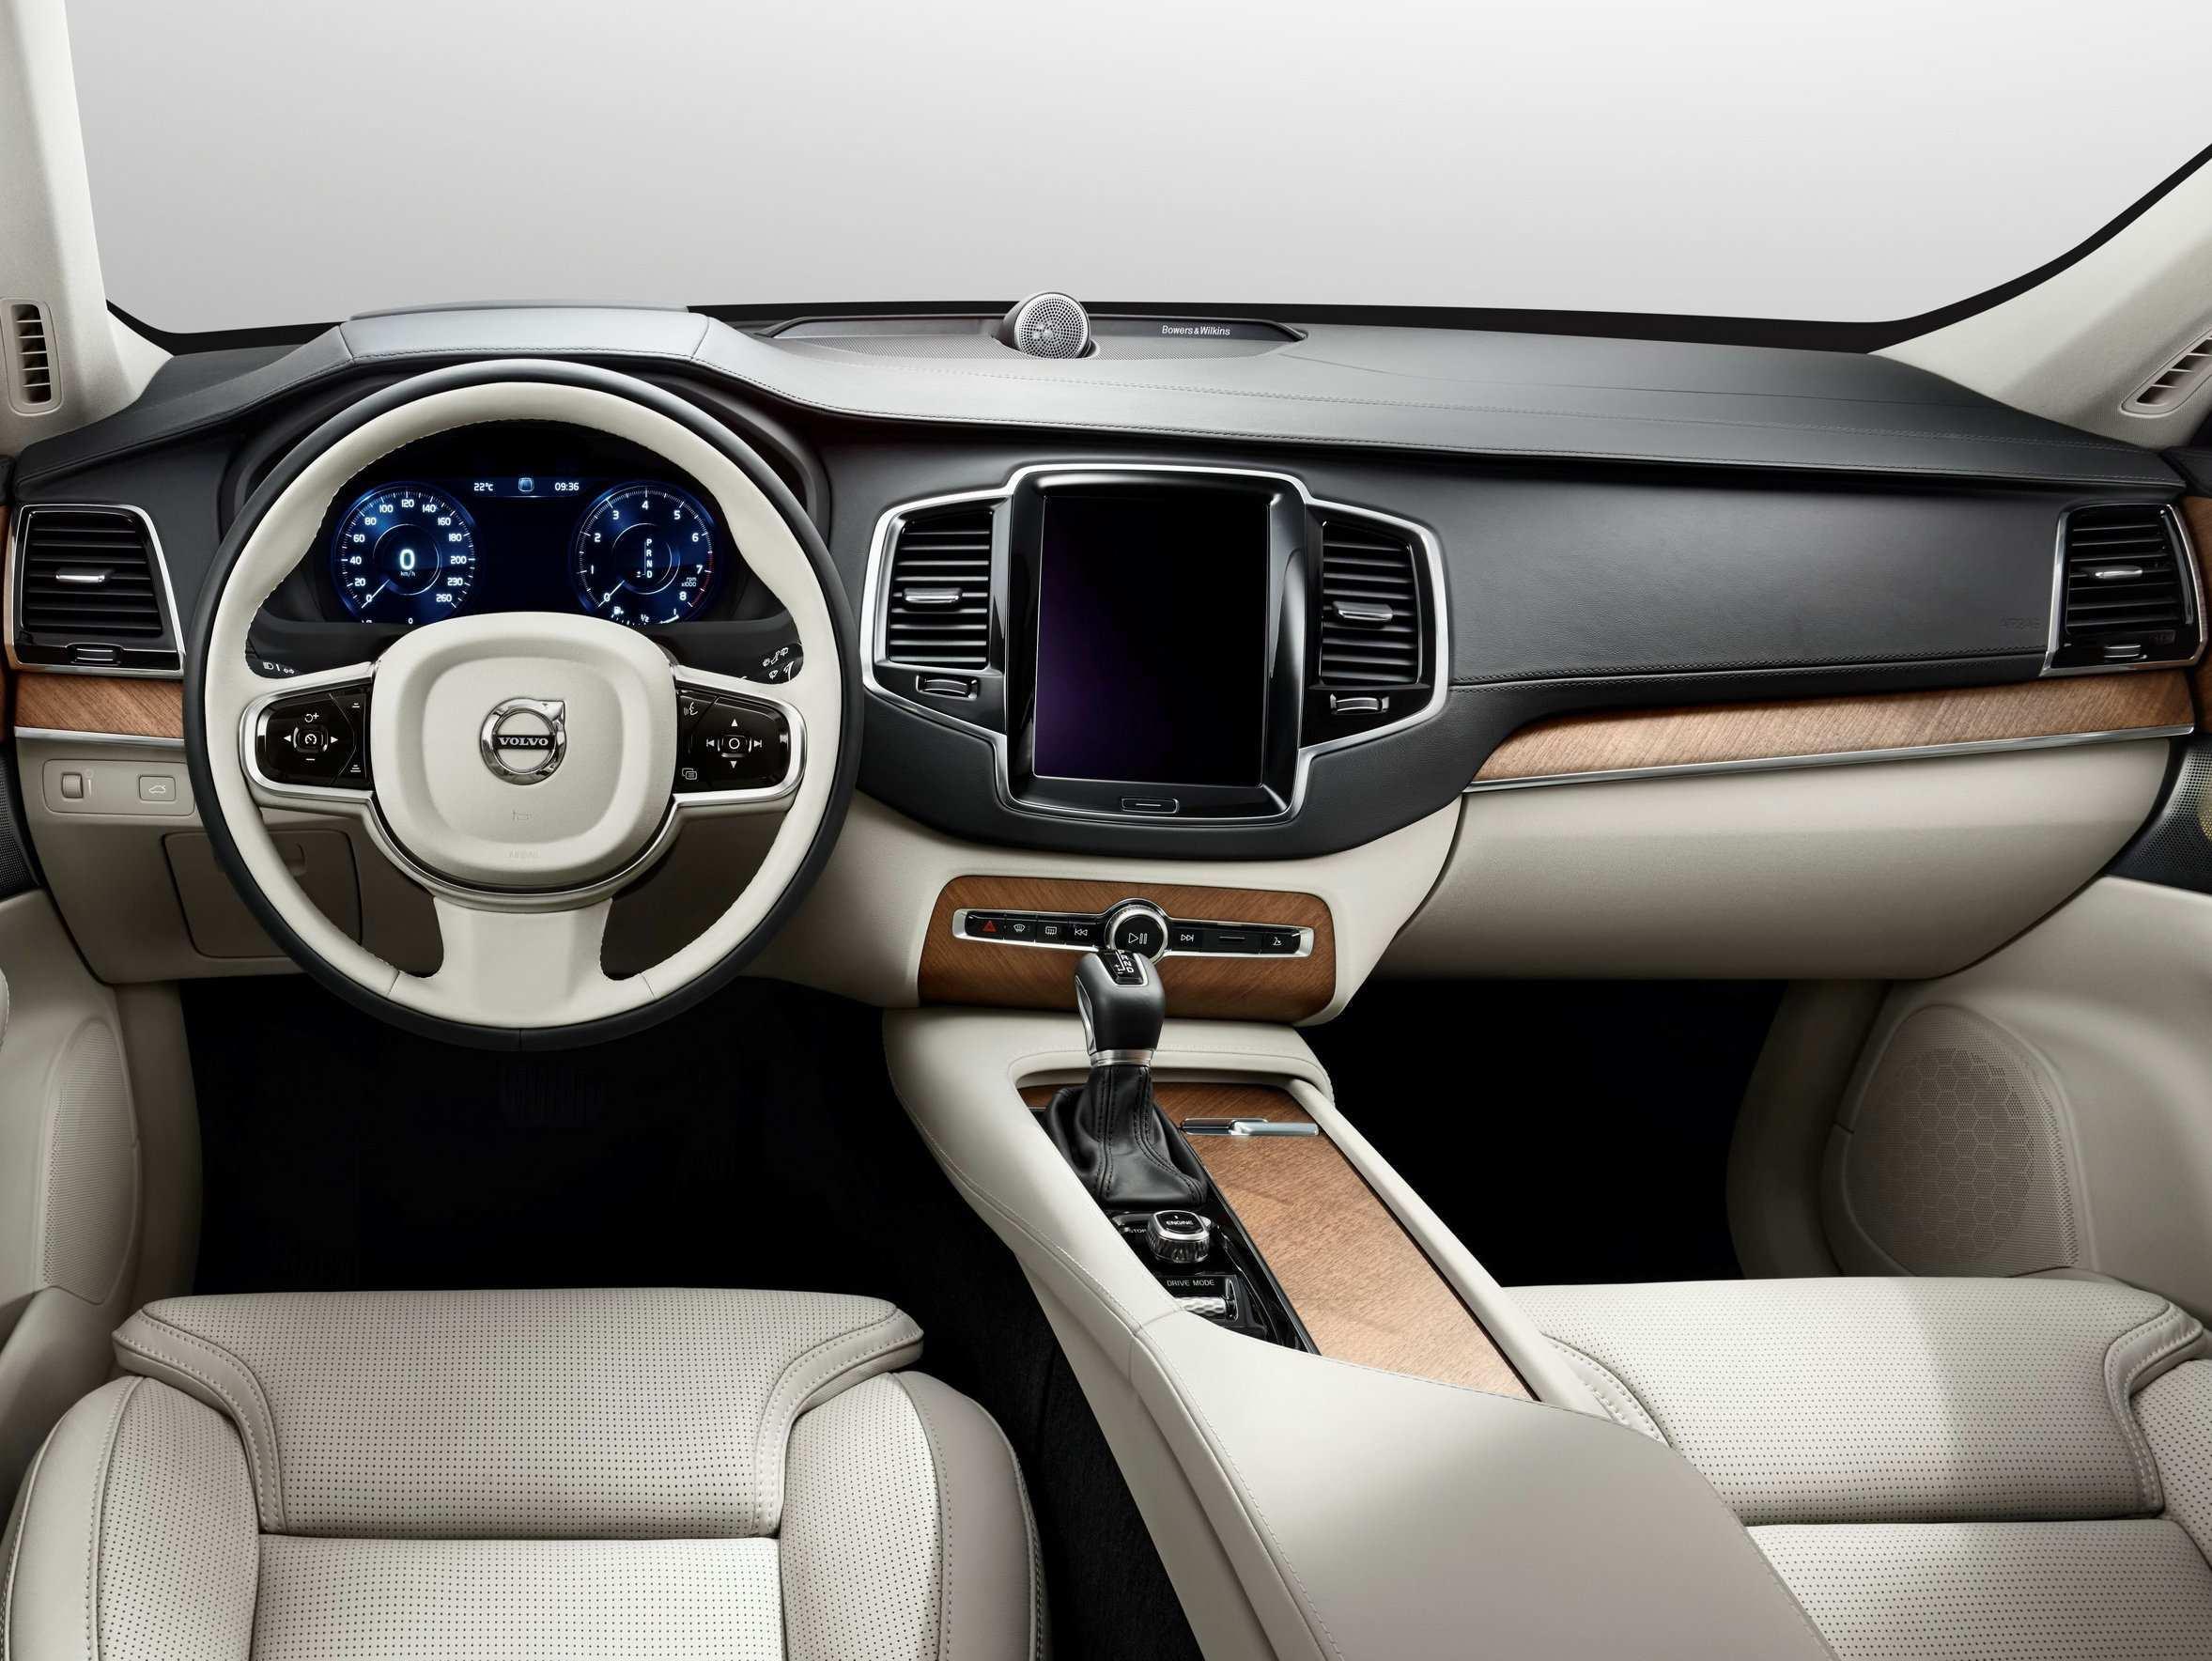 35 New Volvo Xc90 2019 Interior Speed Test with Volvo Xc90 2019 Interior